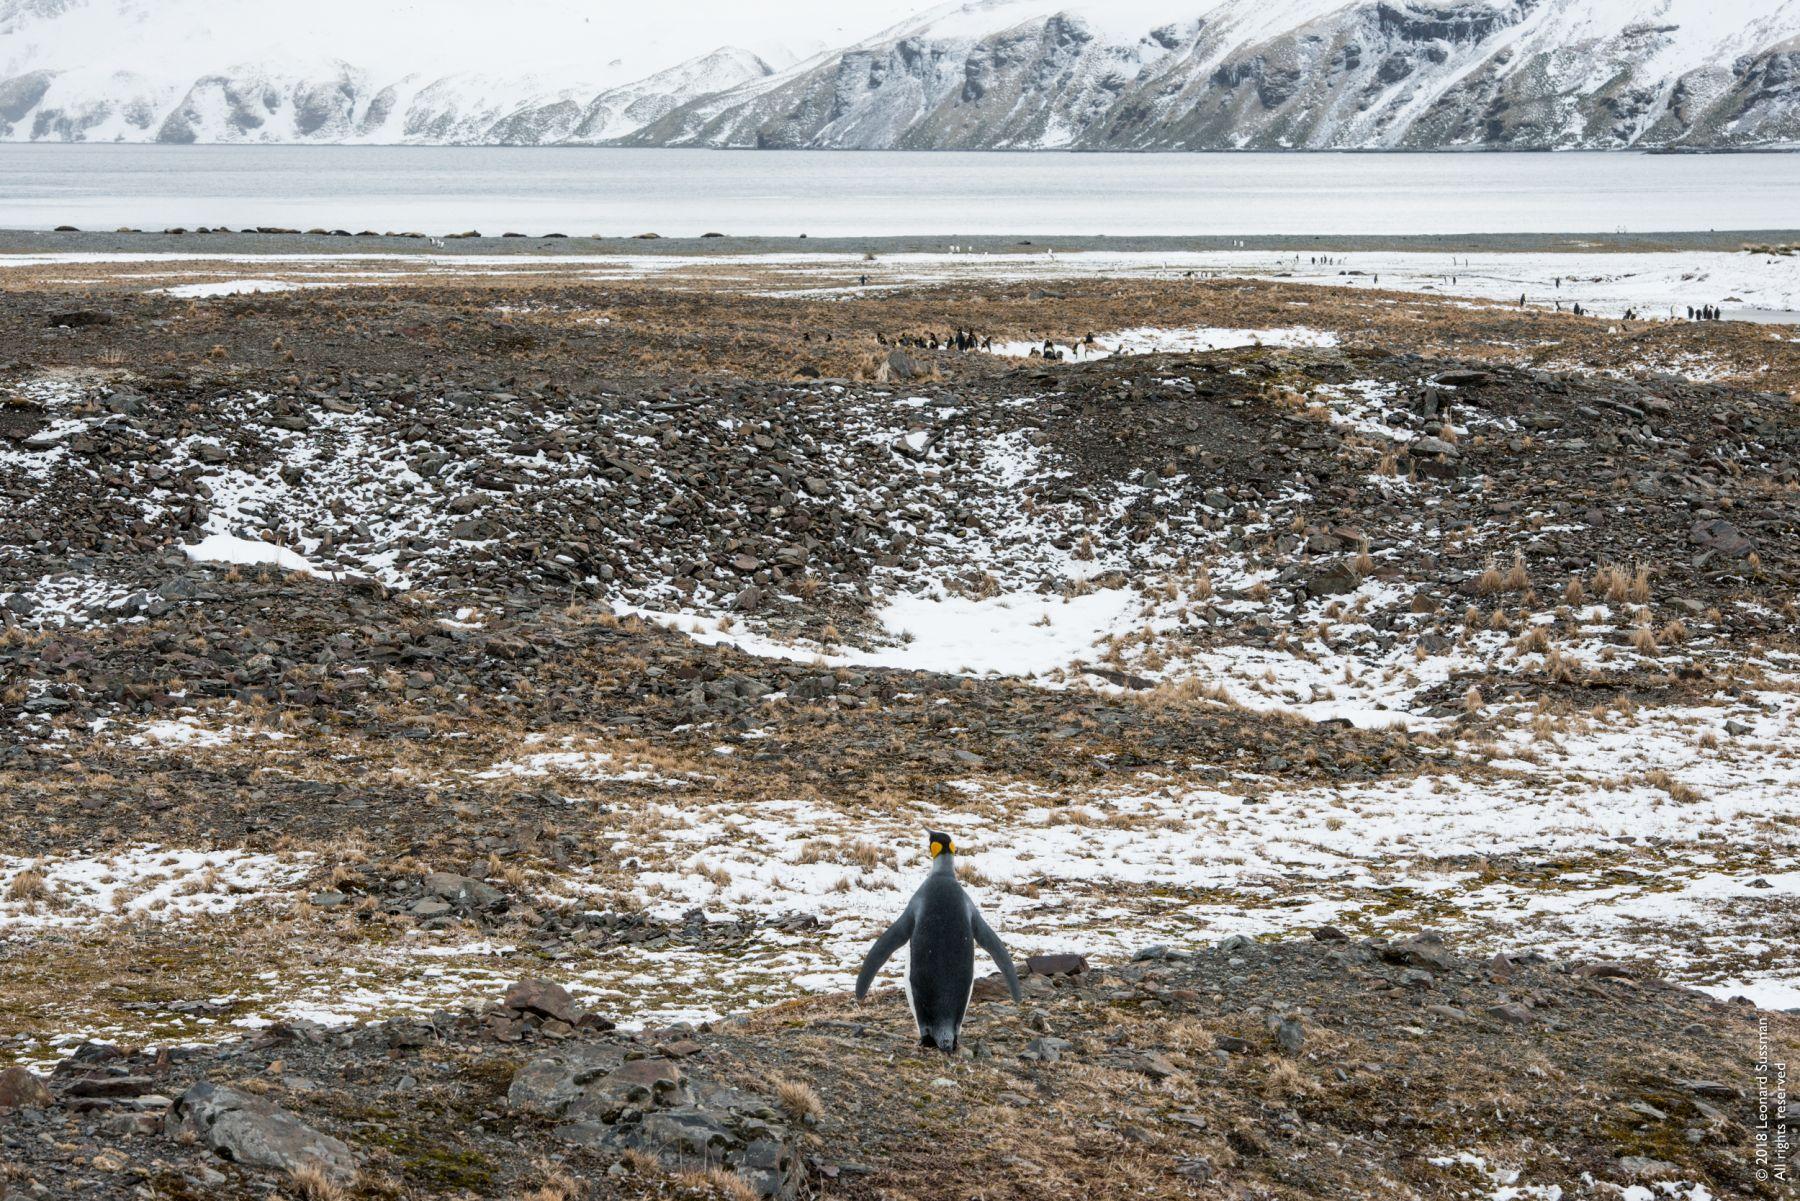 King Penguin Surveying Its World, Fortuna Bay, South Georgia Islands